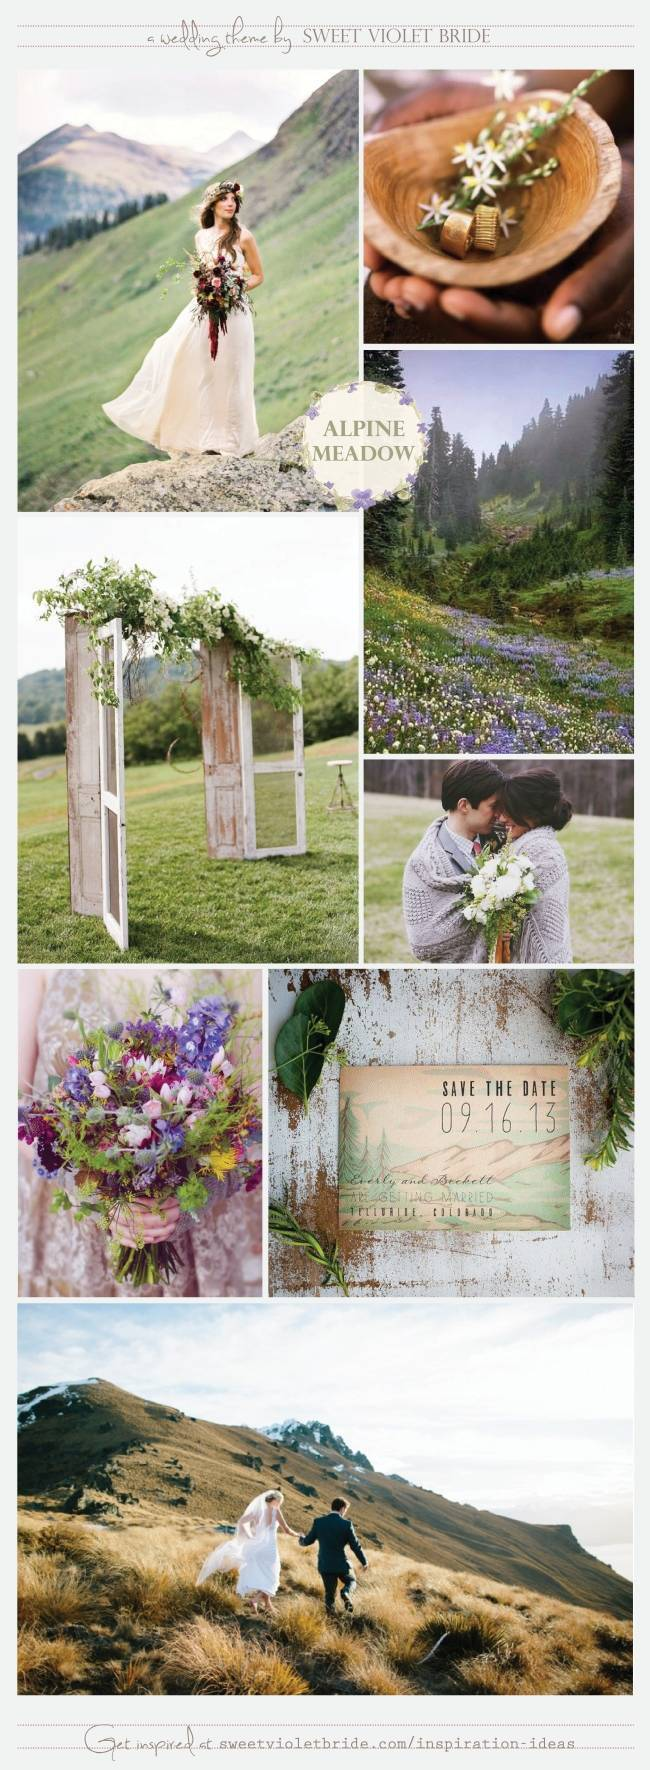 Wedding Inspiration Board #29: Alpine Meadow